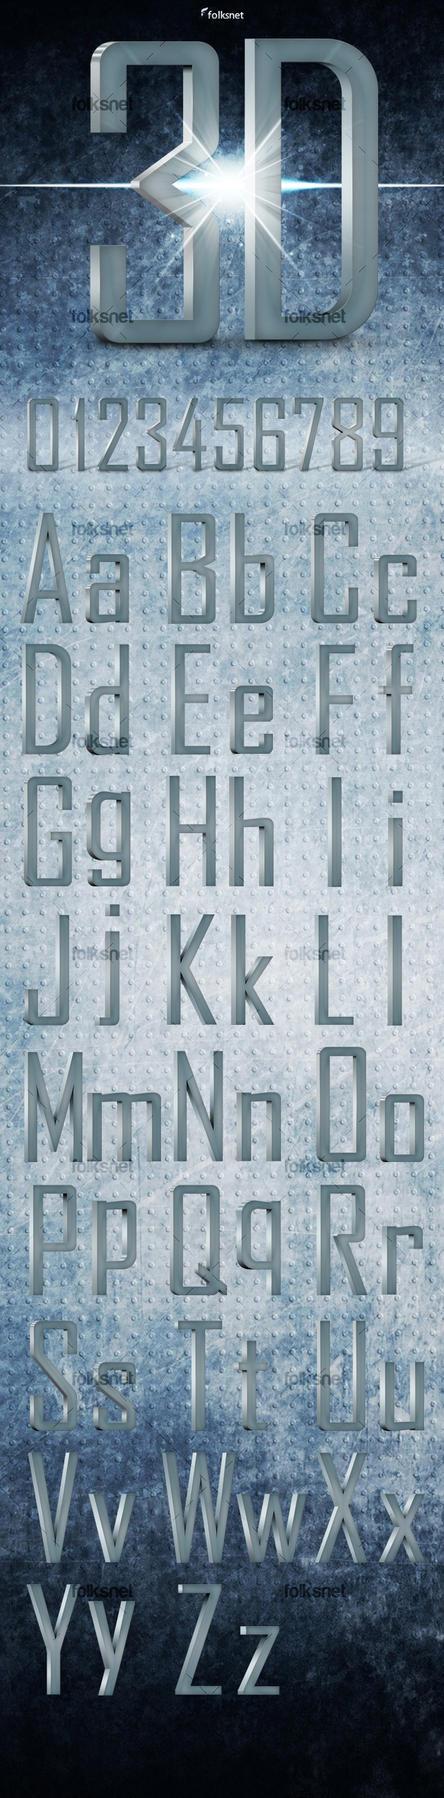 3D Metal Font by GrDezign